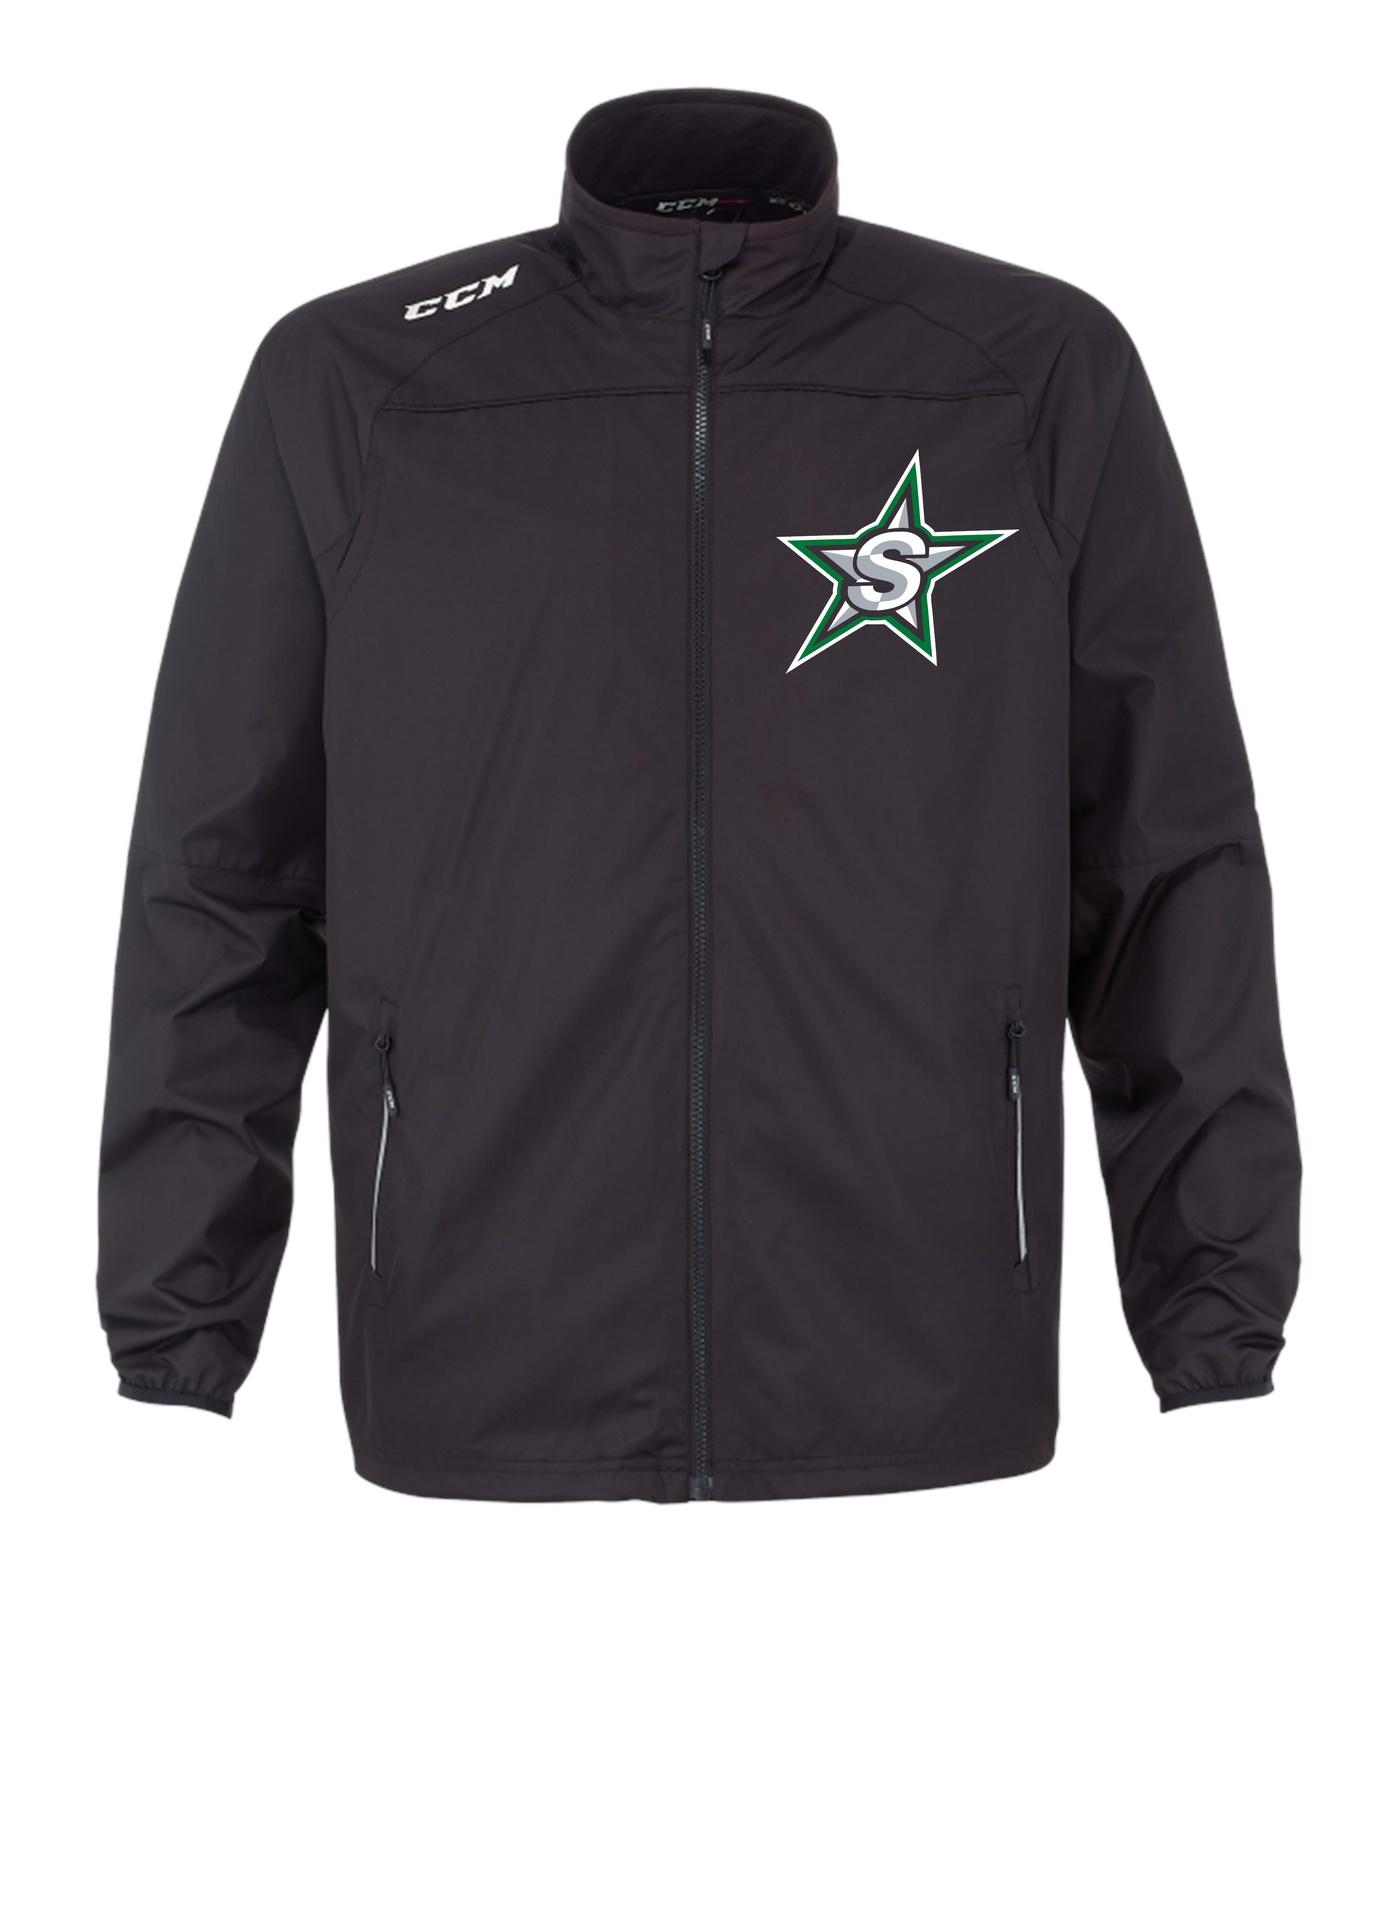 Stars CCM Lightweight Jacket